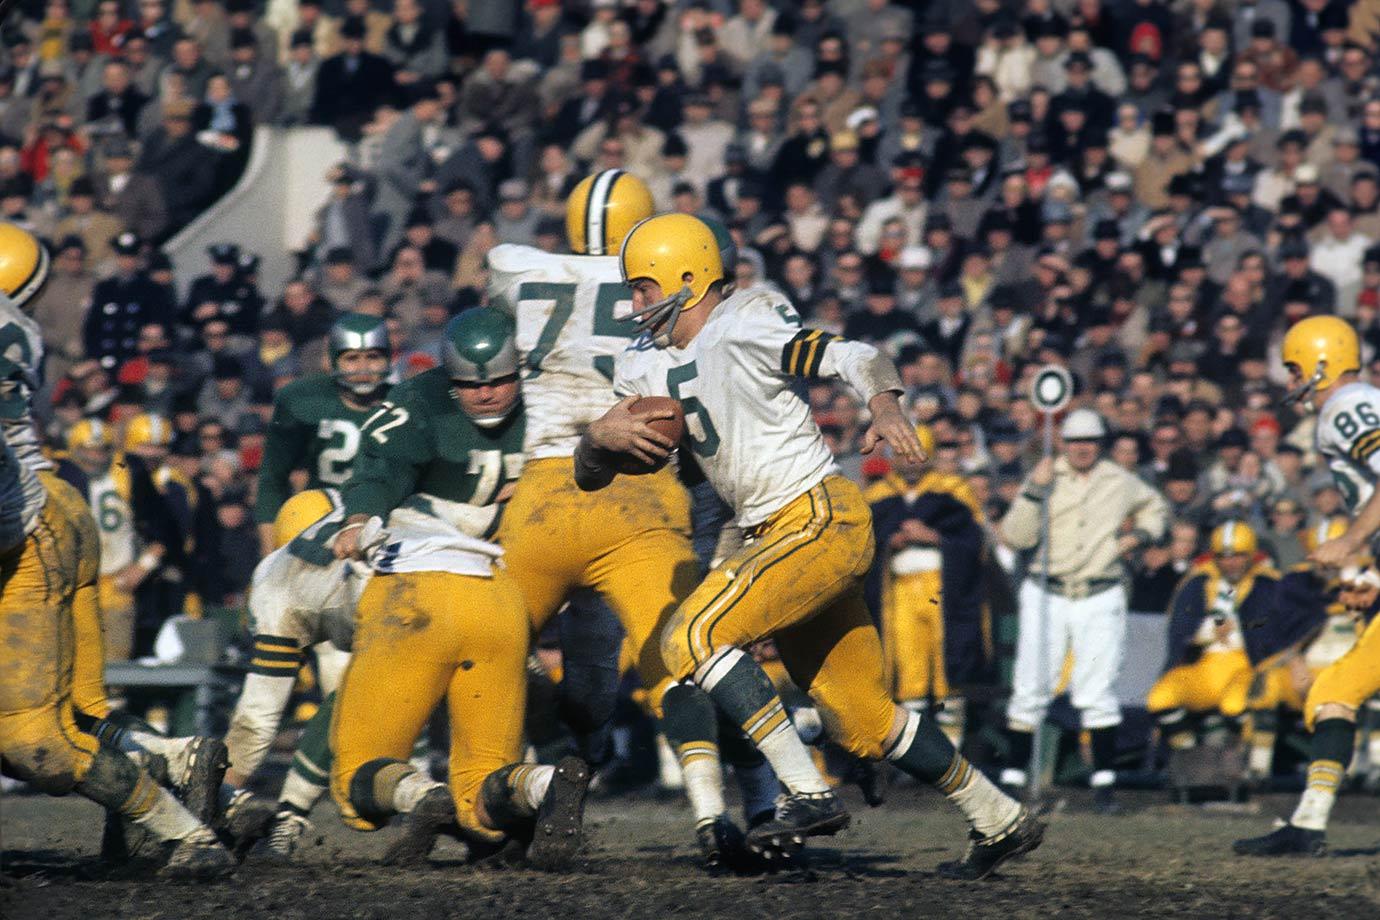 Dec. 26, 1960 (NFL Championship) — Green Bay Packers vs. Philadelphia Eagles